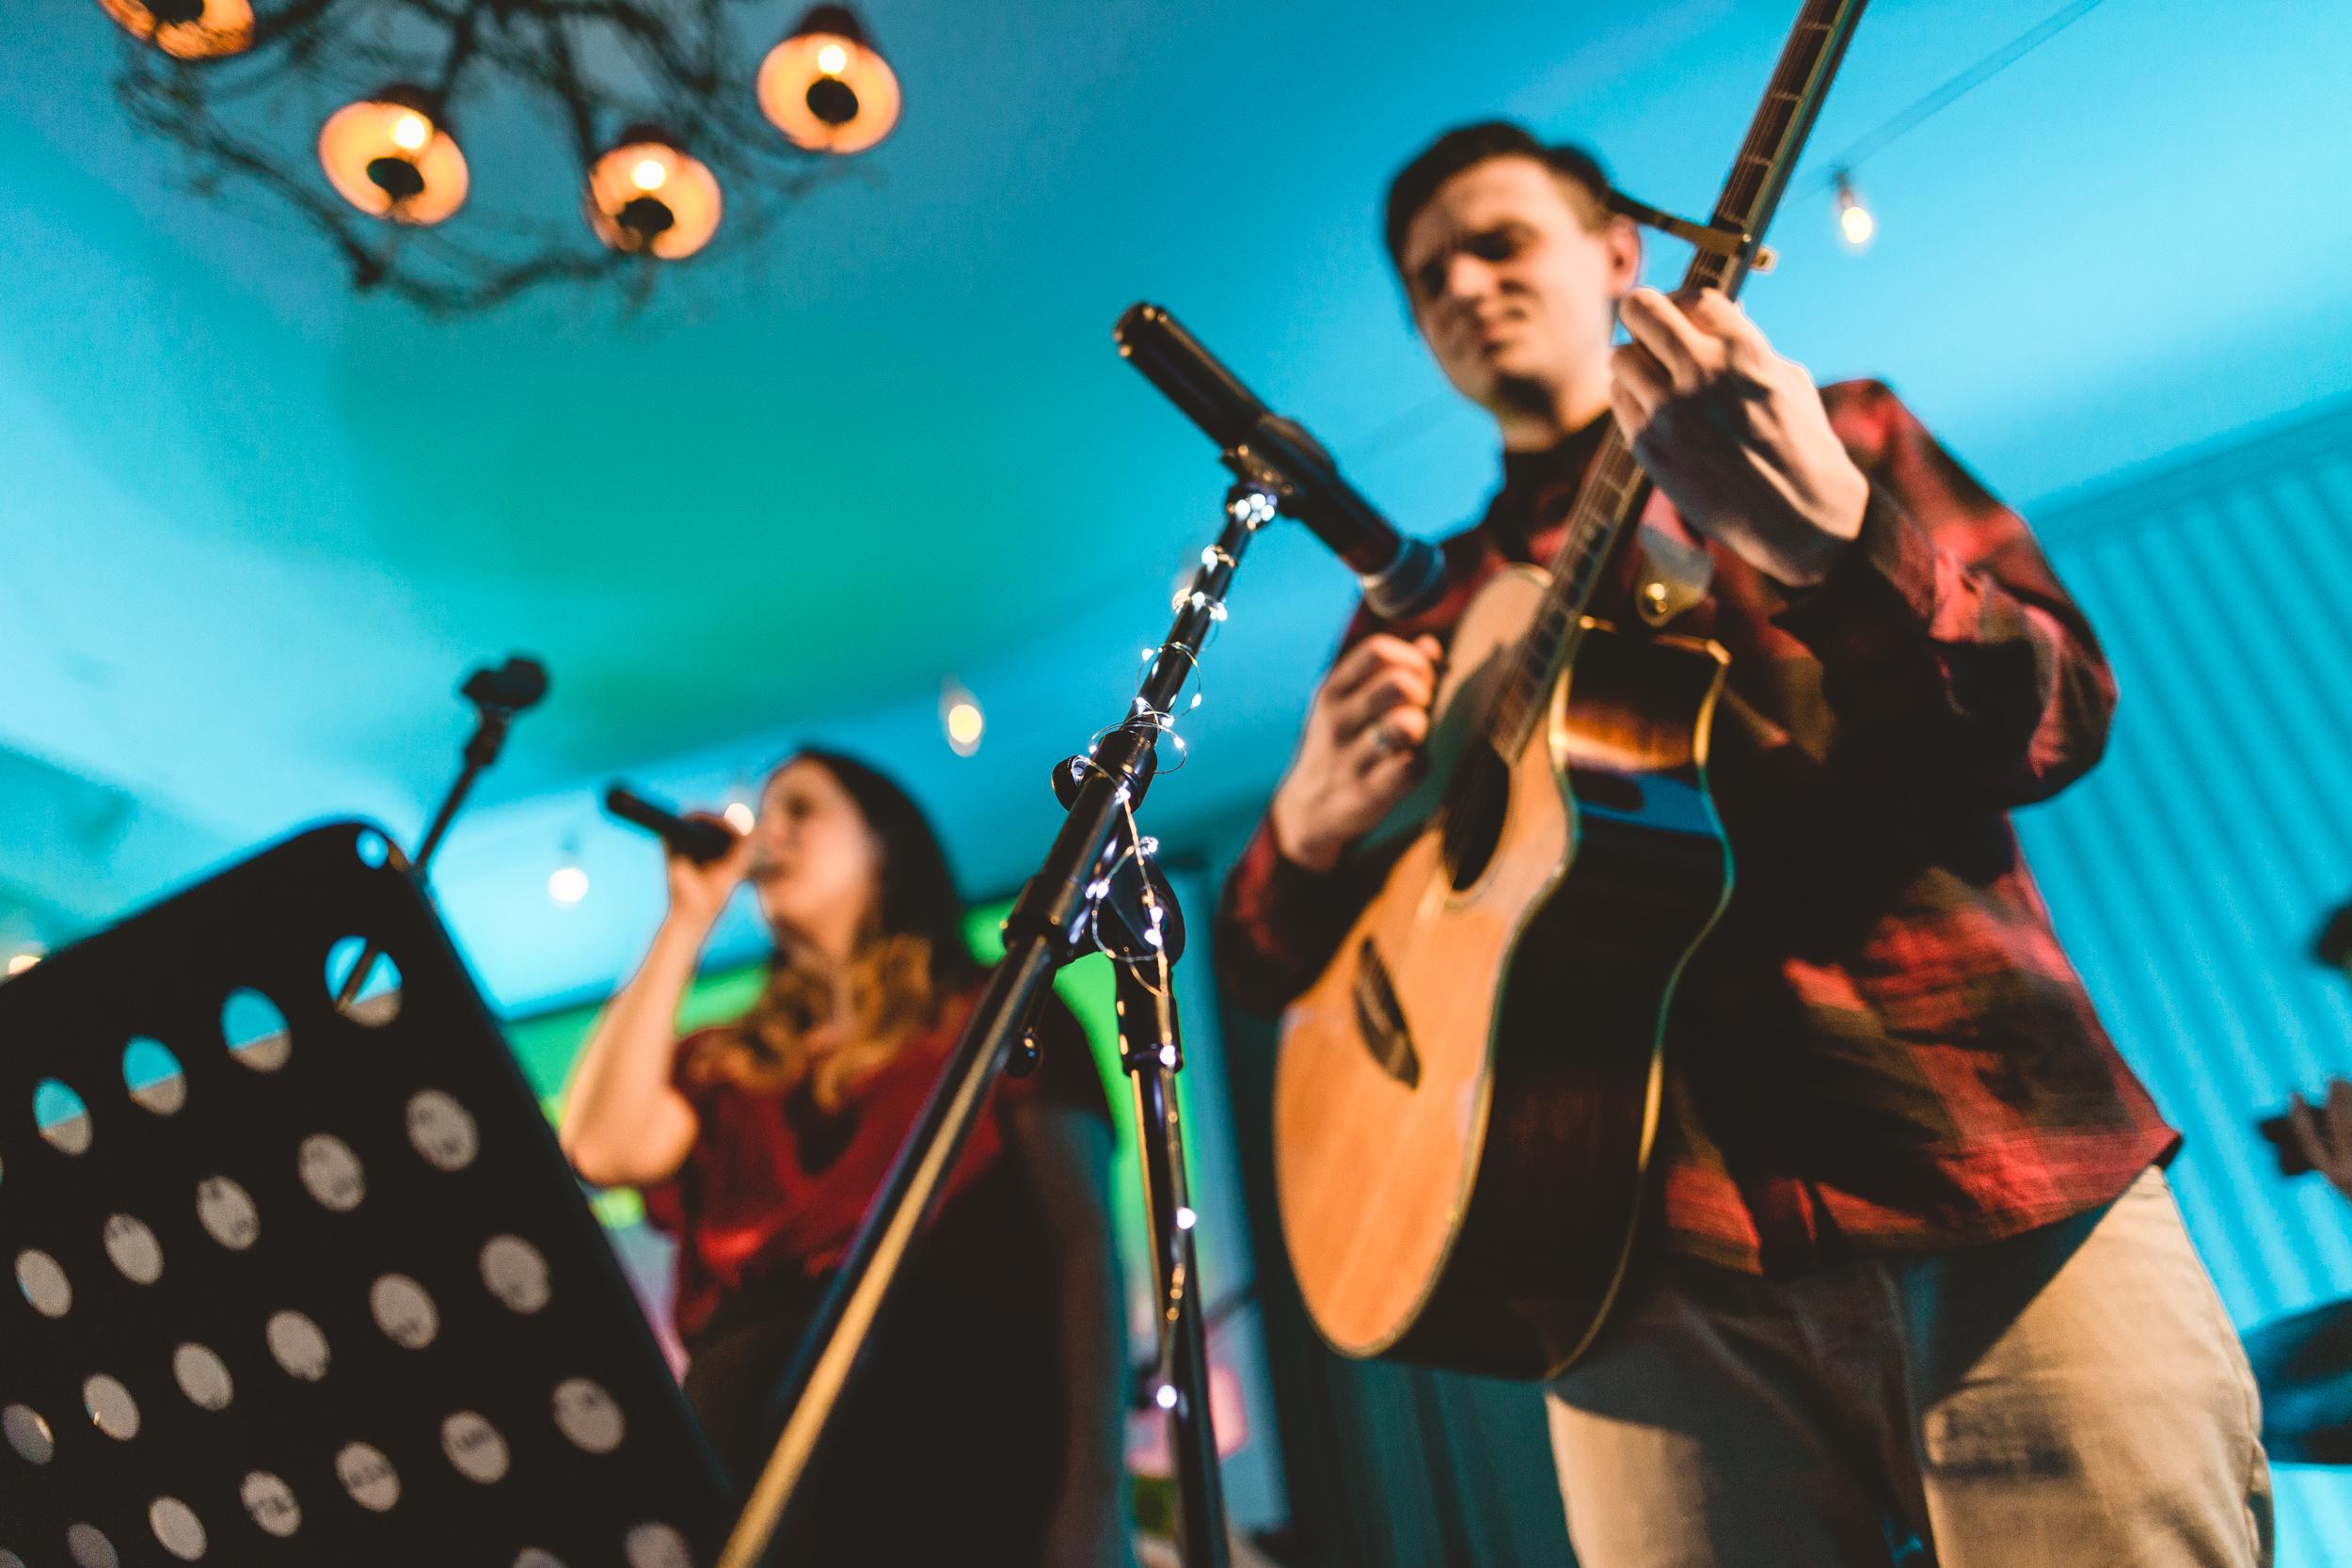 jorspeis-koncerts-ramavas-muiza-2016-8.jpg